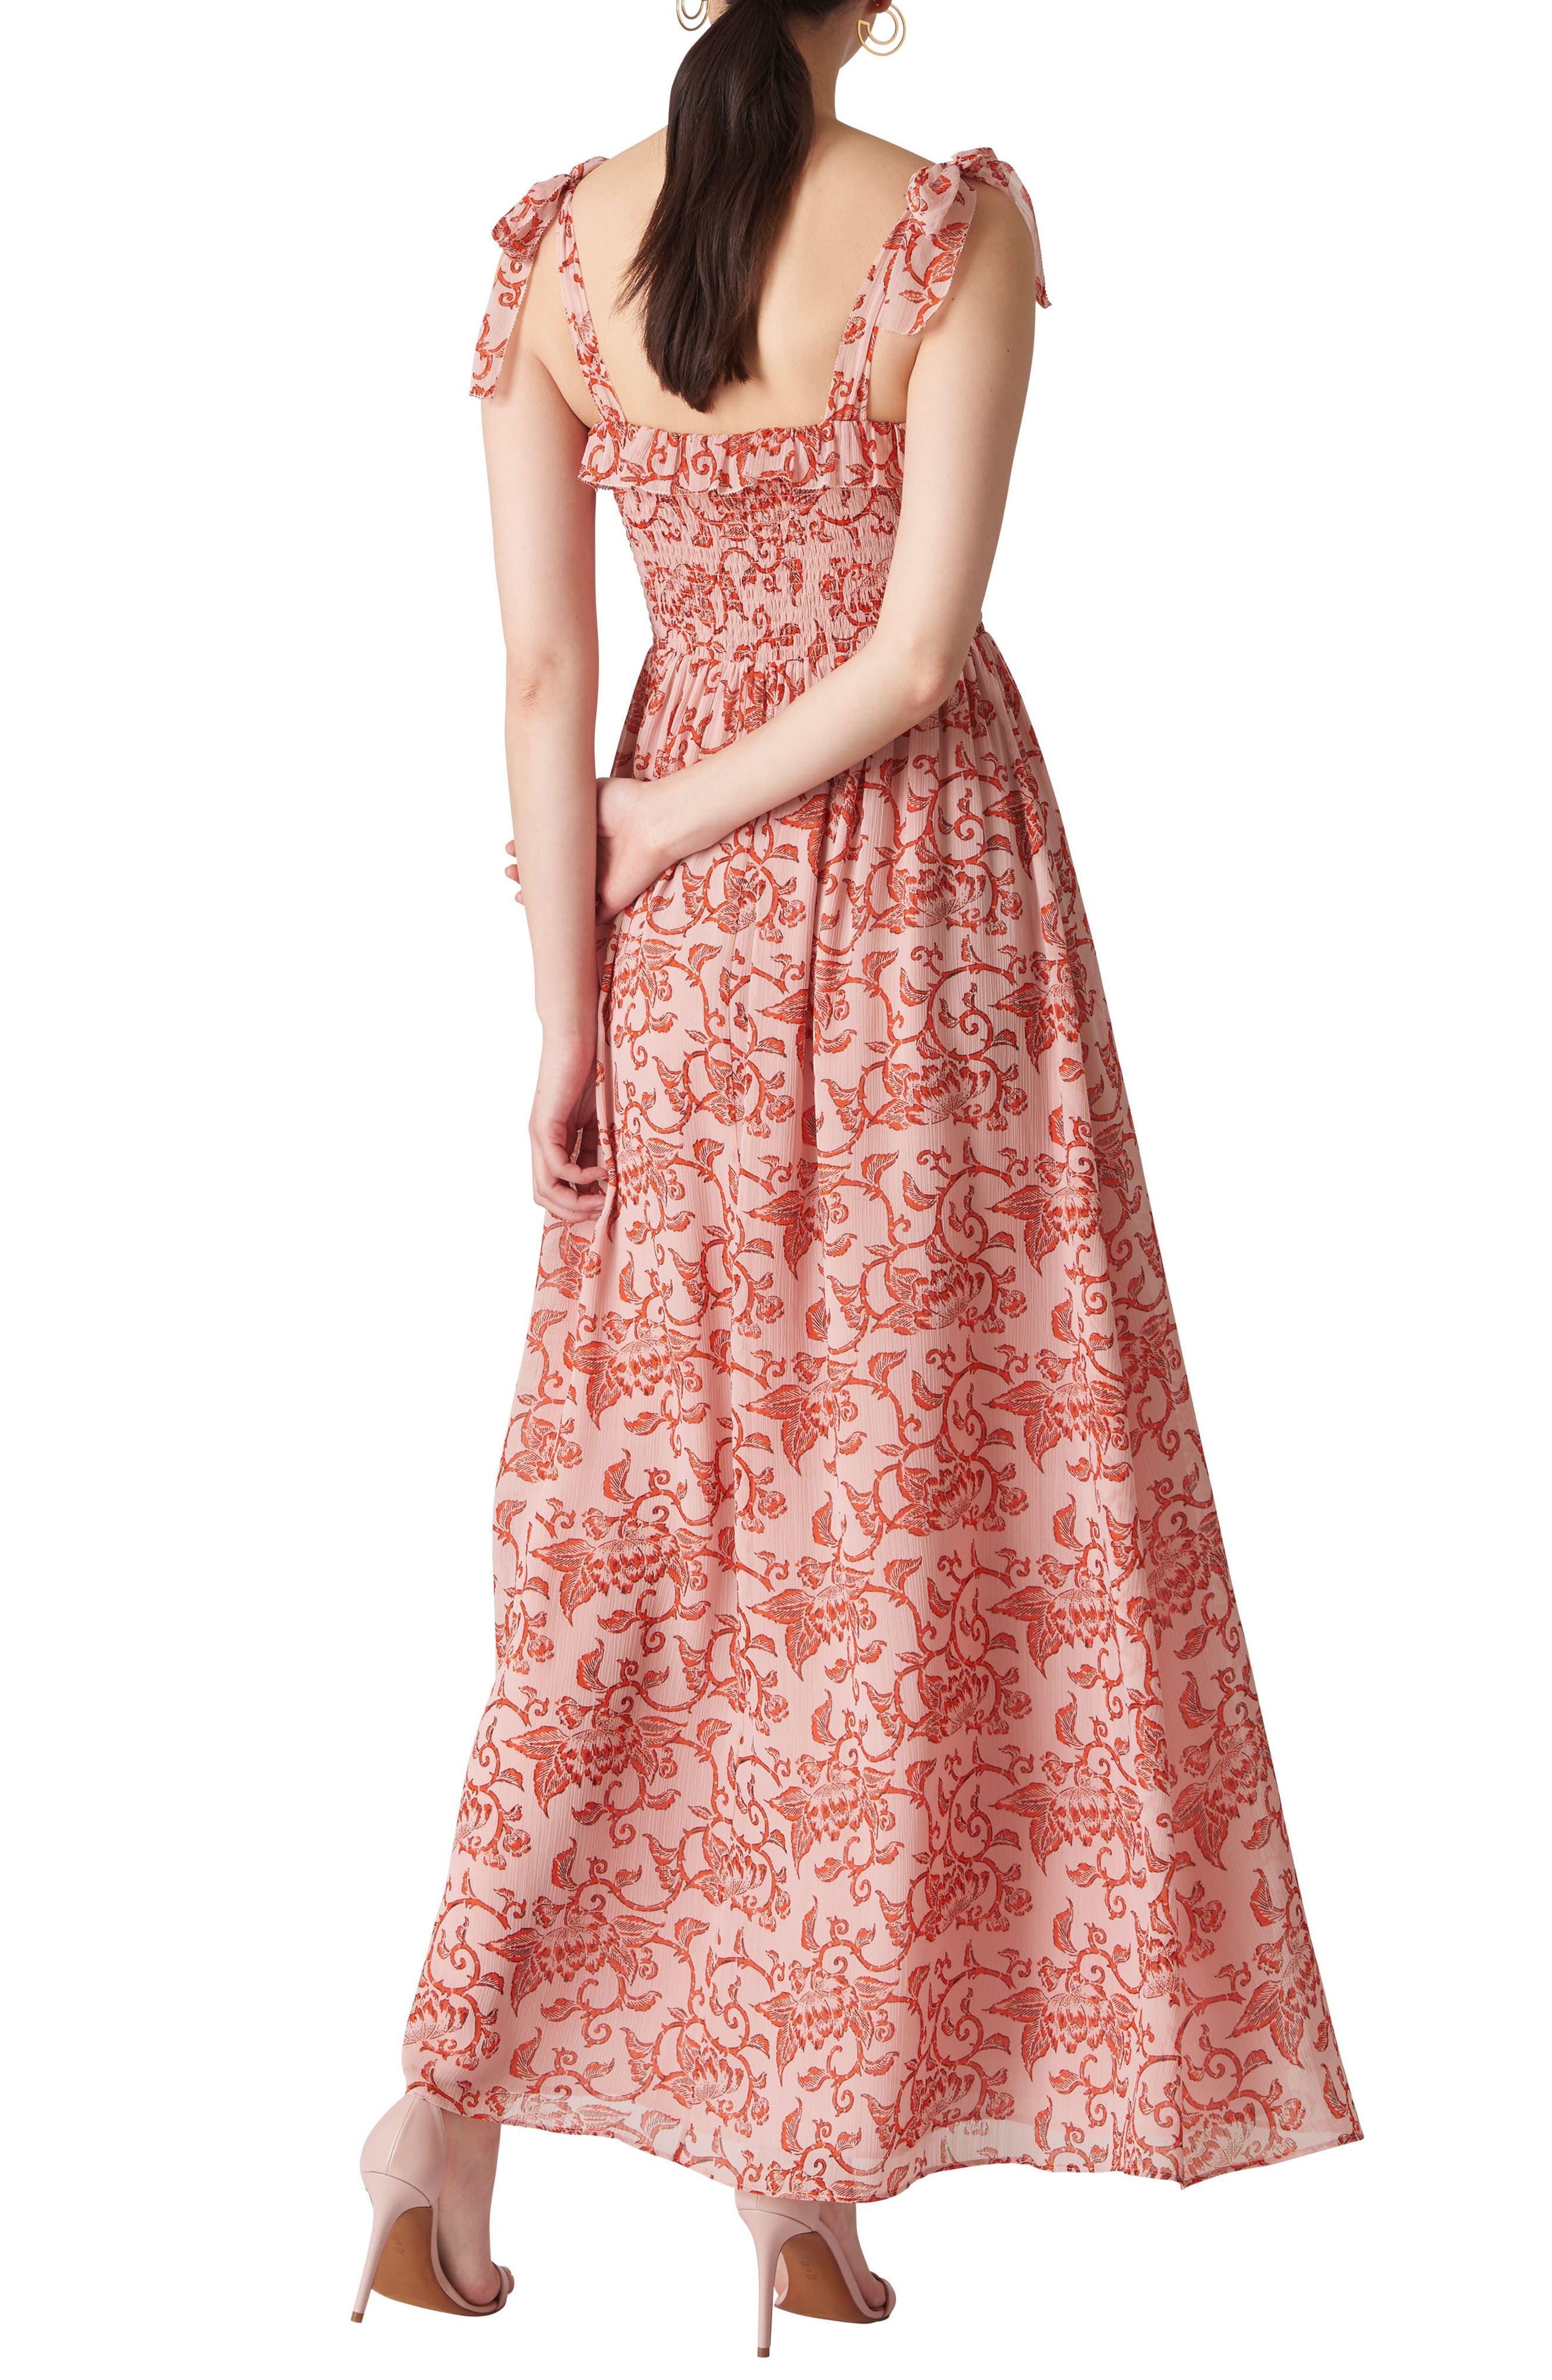 Bali Print Maxi Dress,                             Alternate thumbnail 2, color,                             650